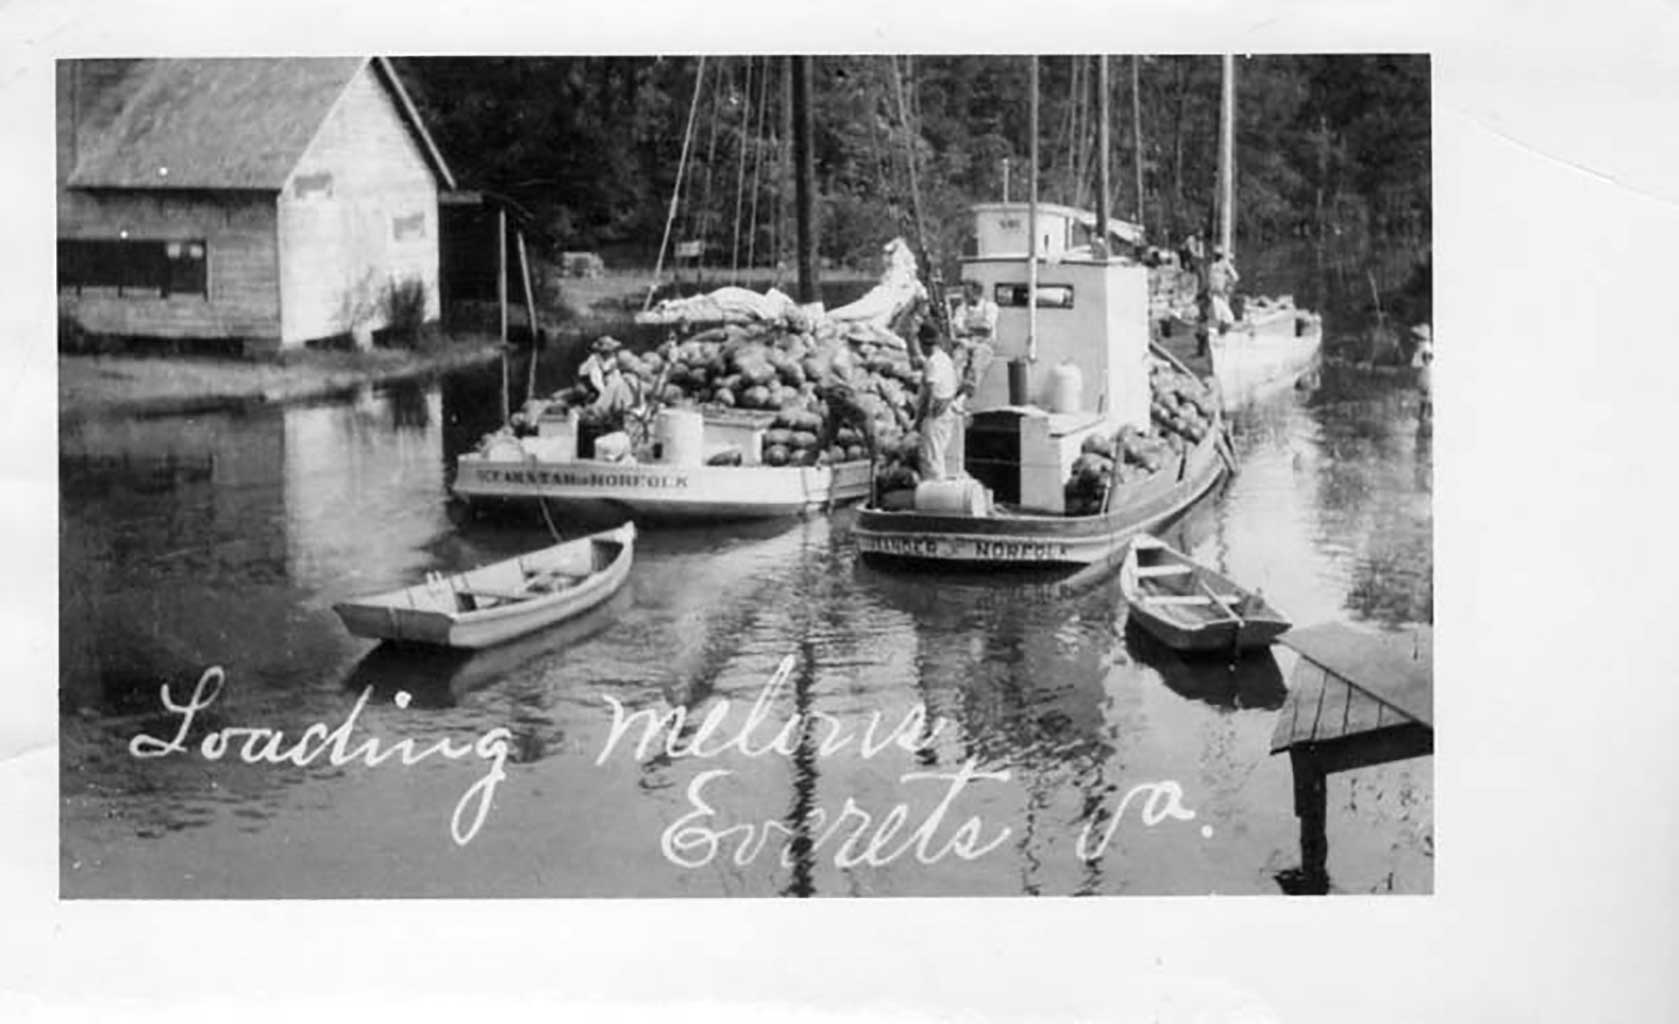 loading-melons-at-everet-1914-img204